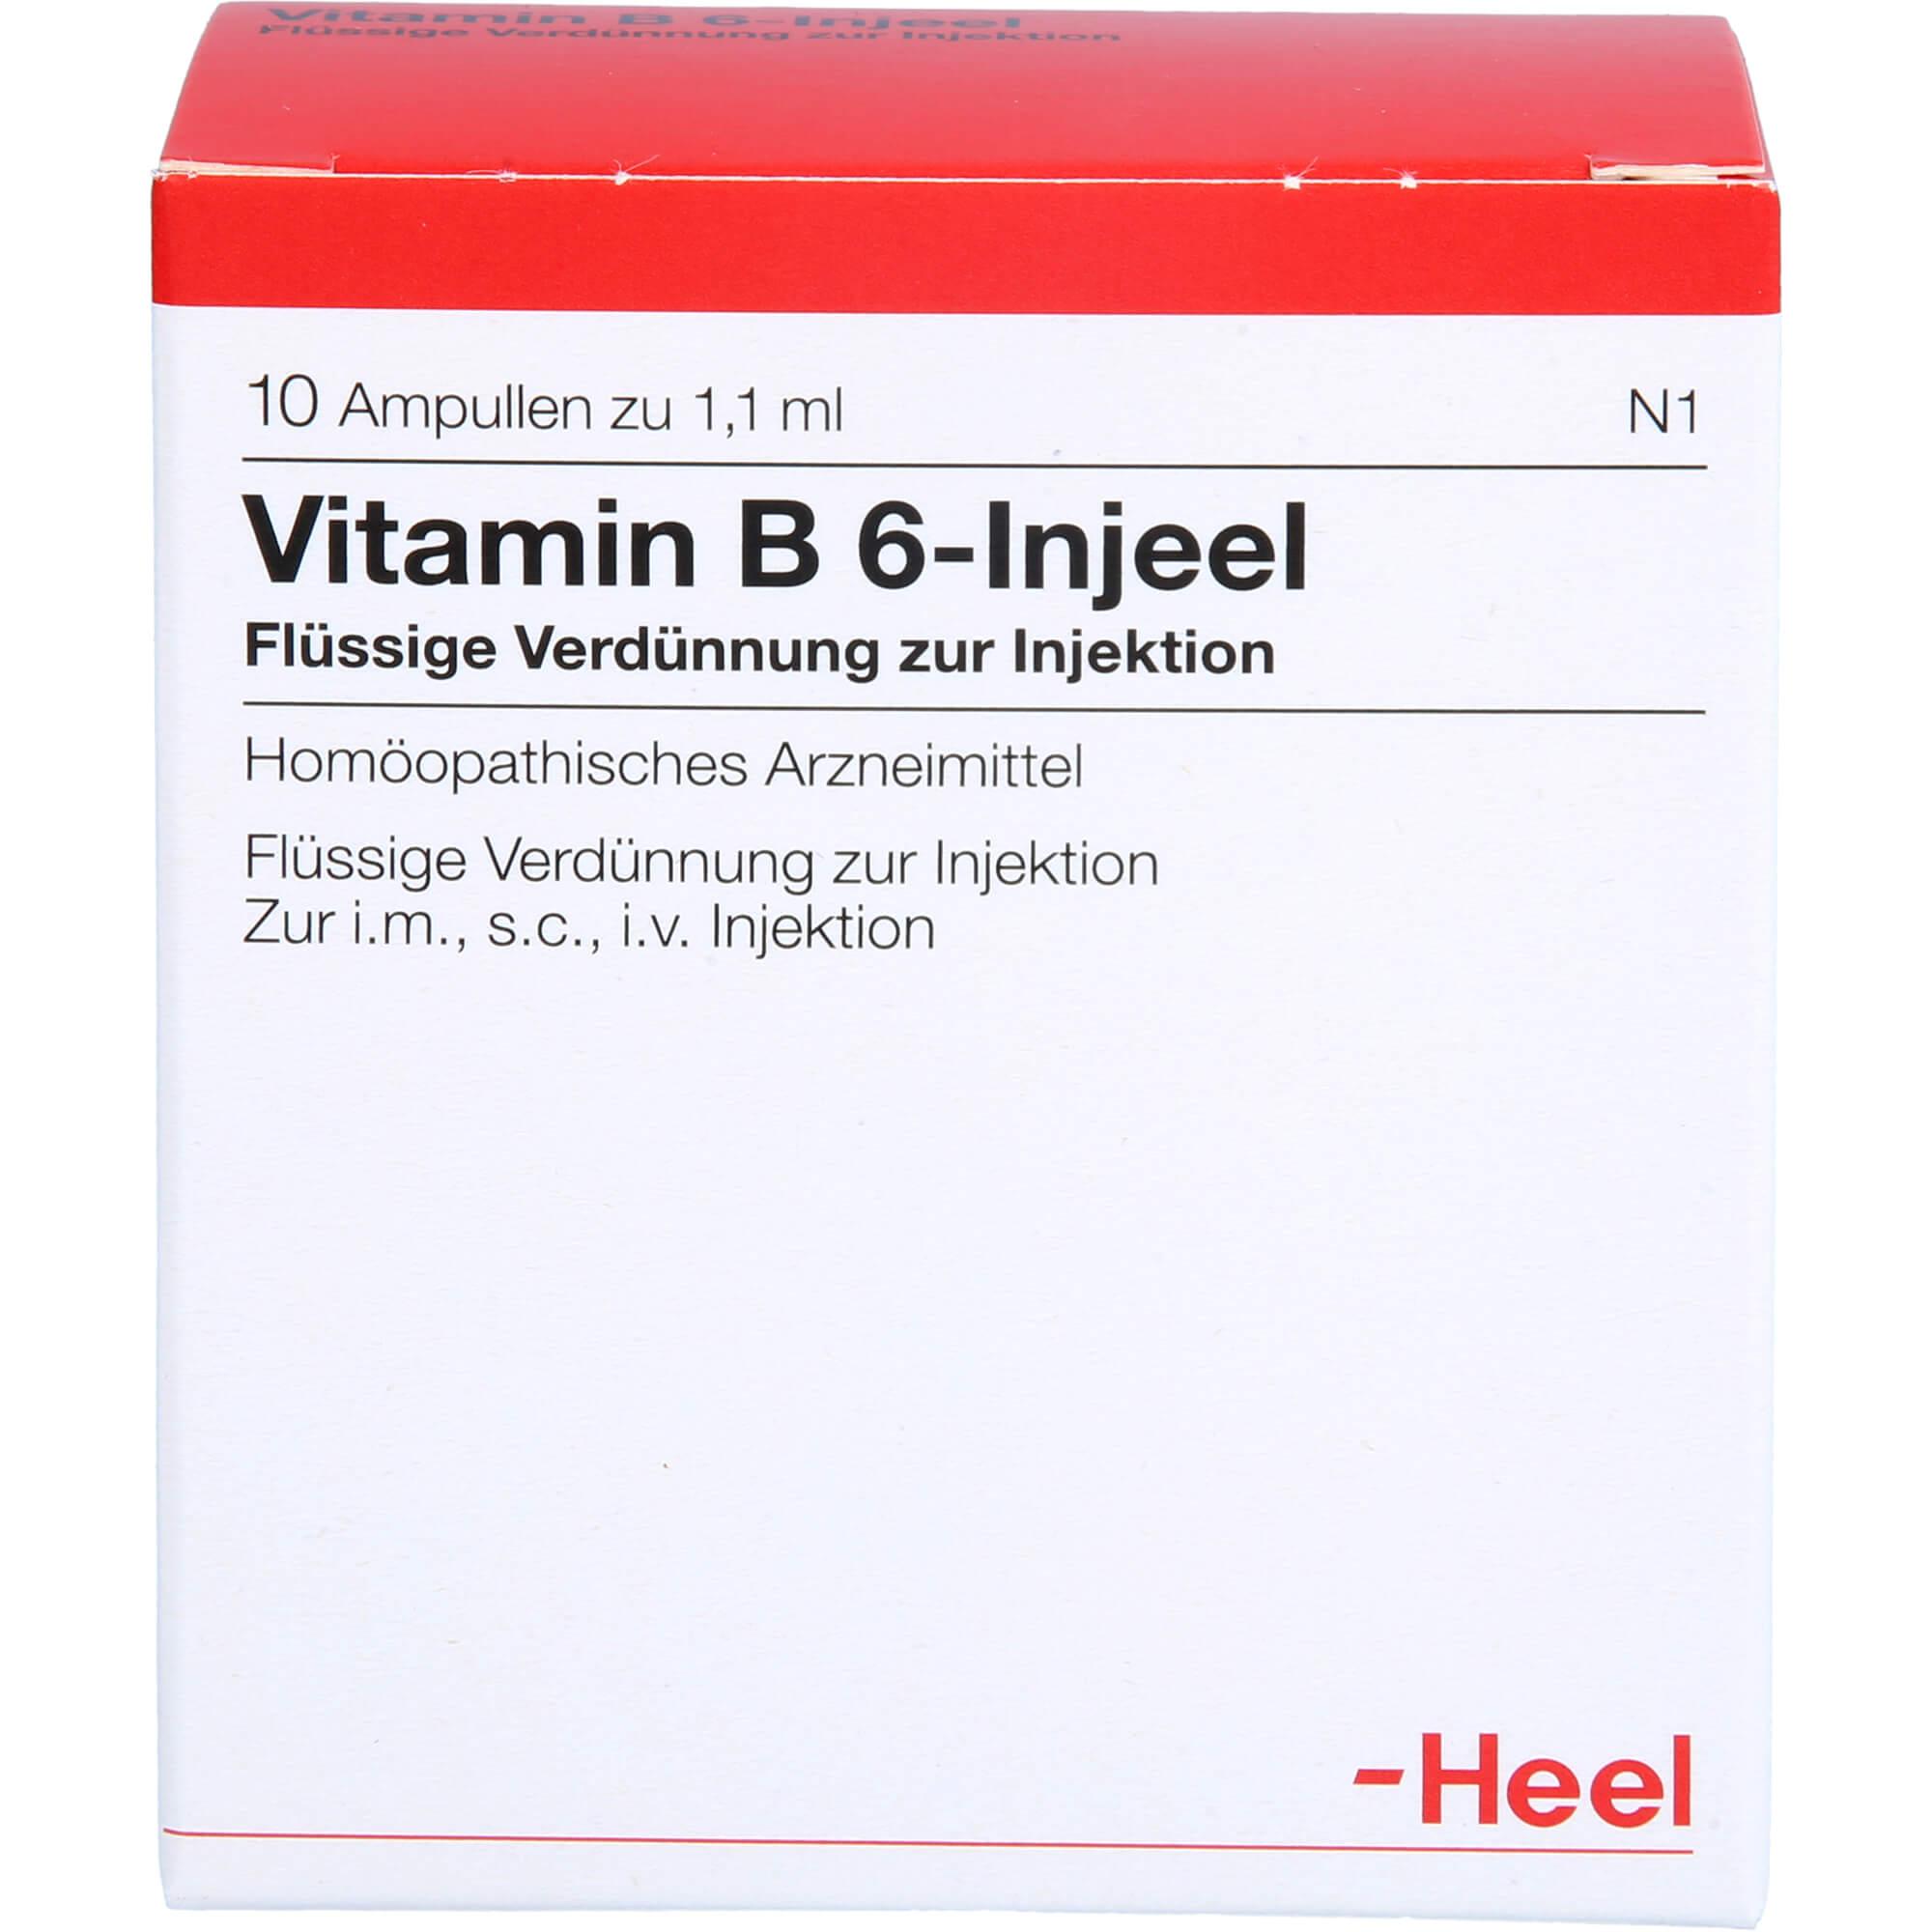 VITAMIN B6 INJEEL Ampullen